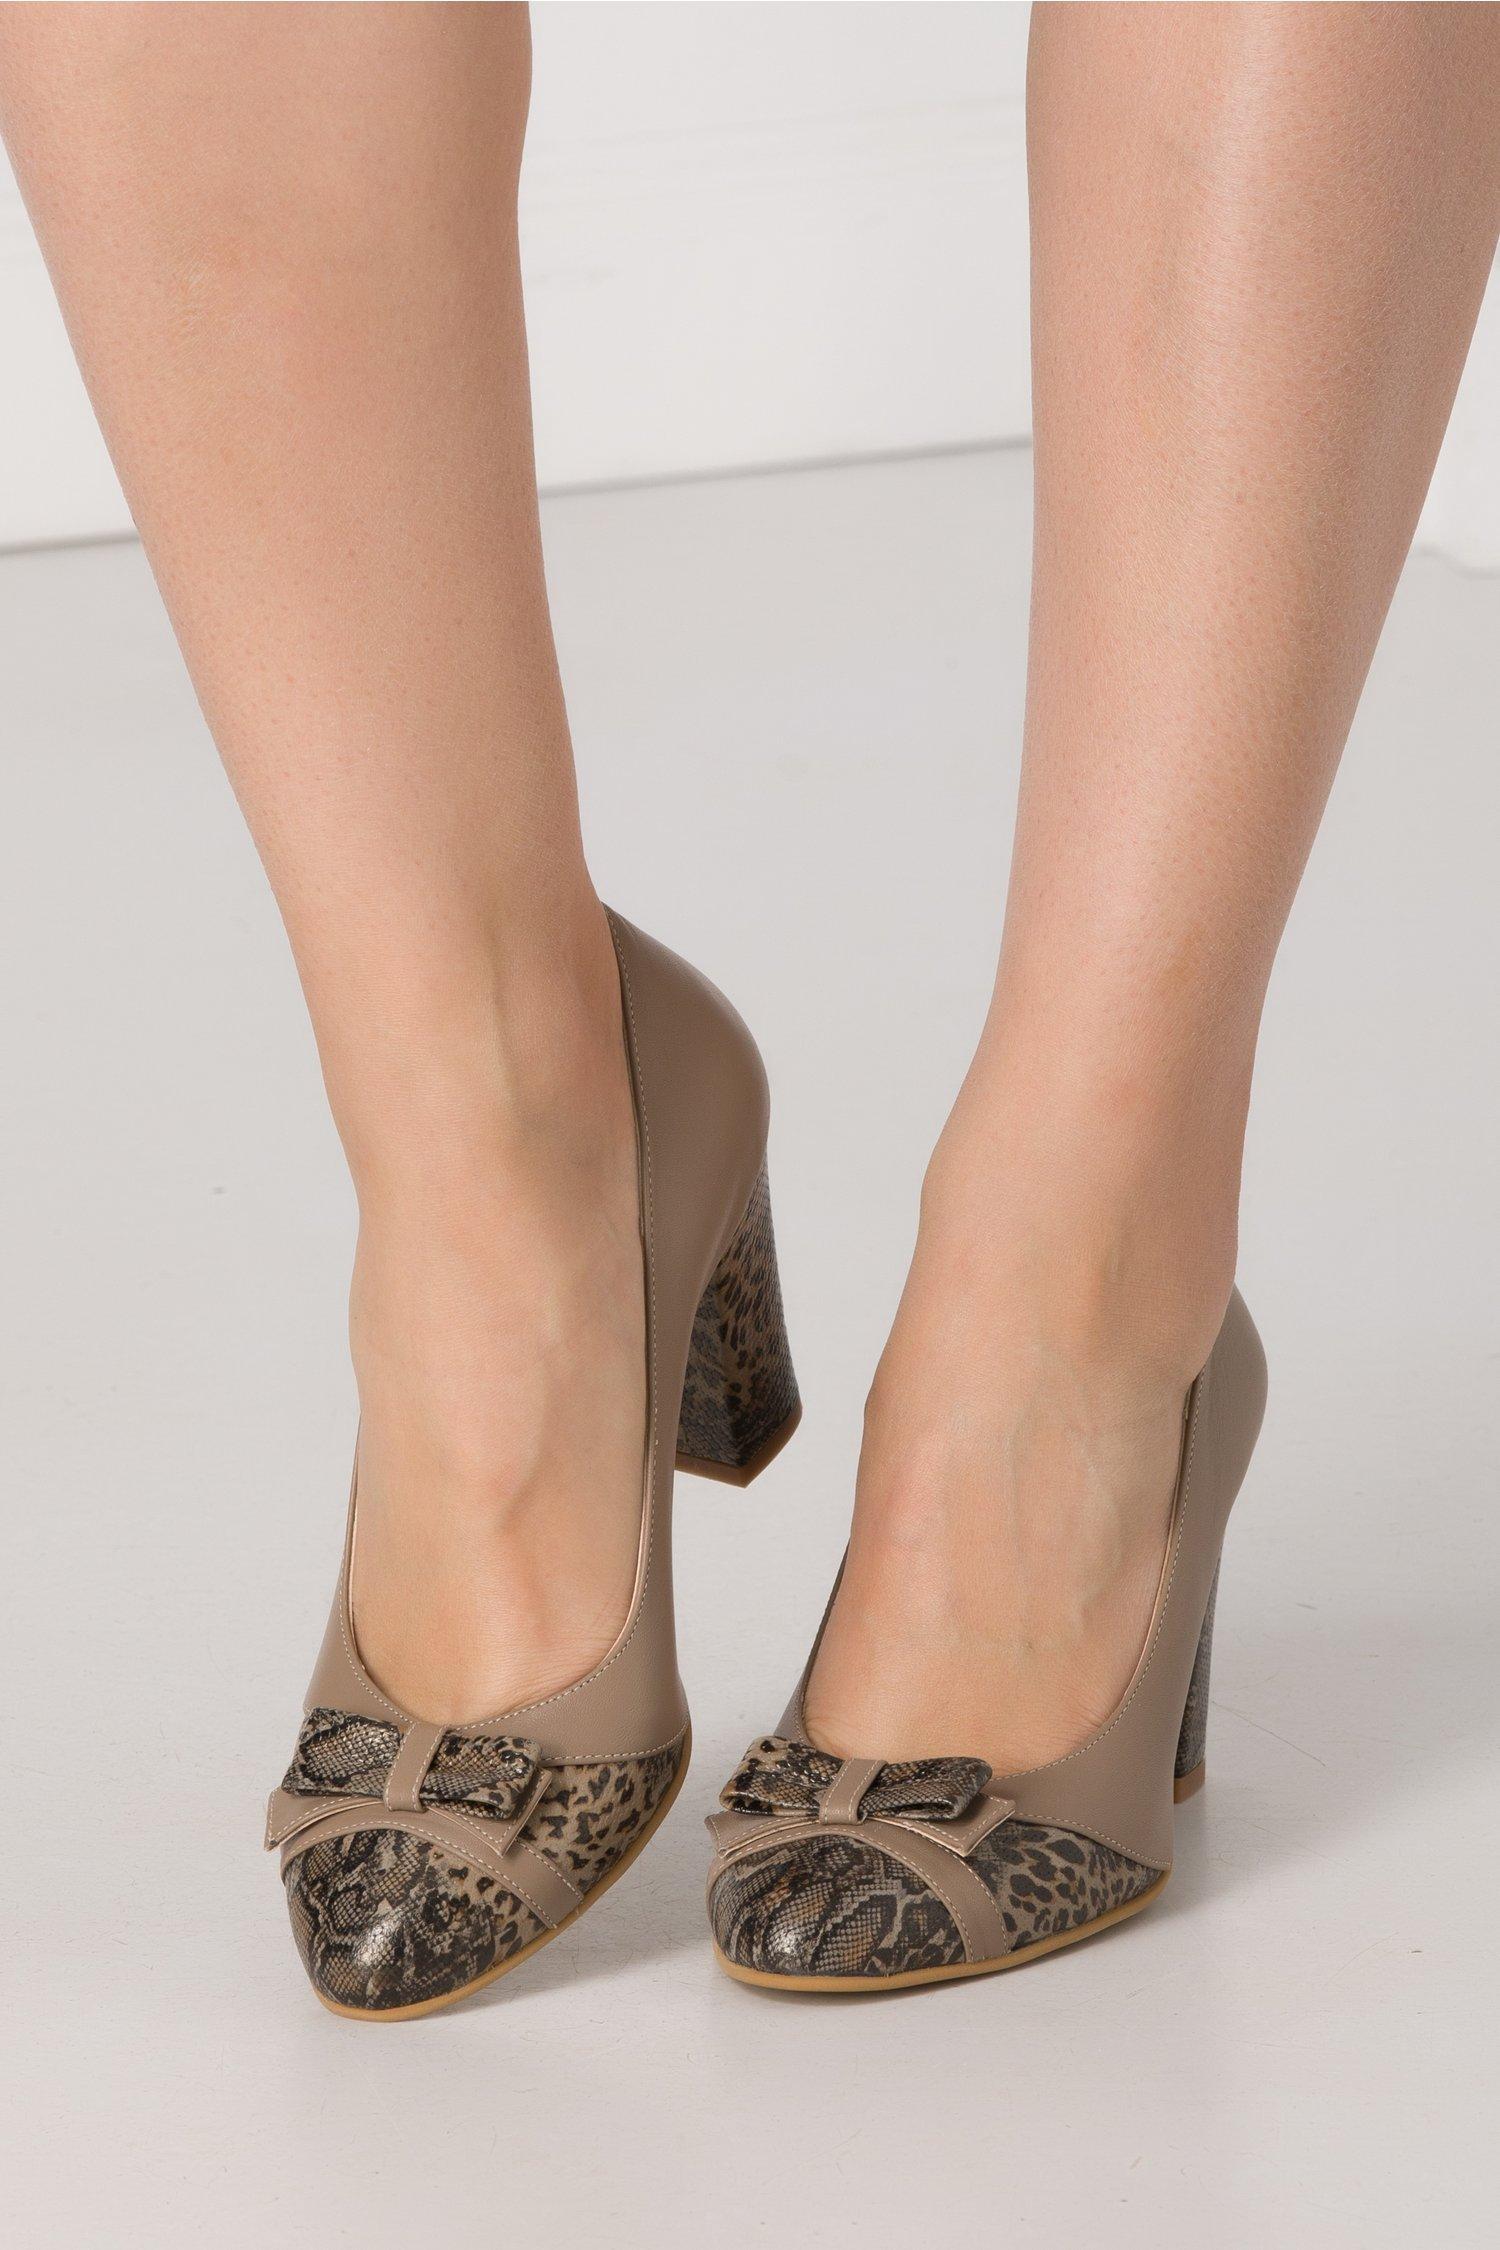 Pantofi office maro cu insertii animal print si fundita in fata